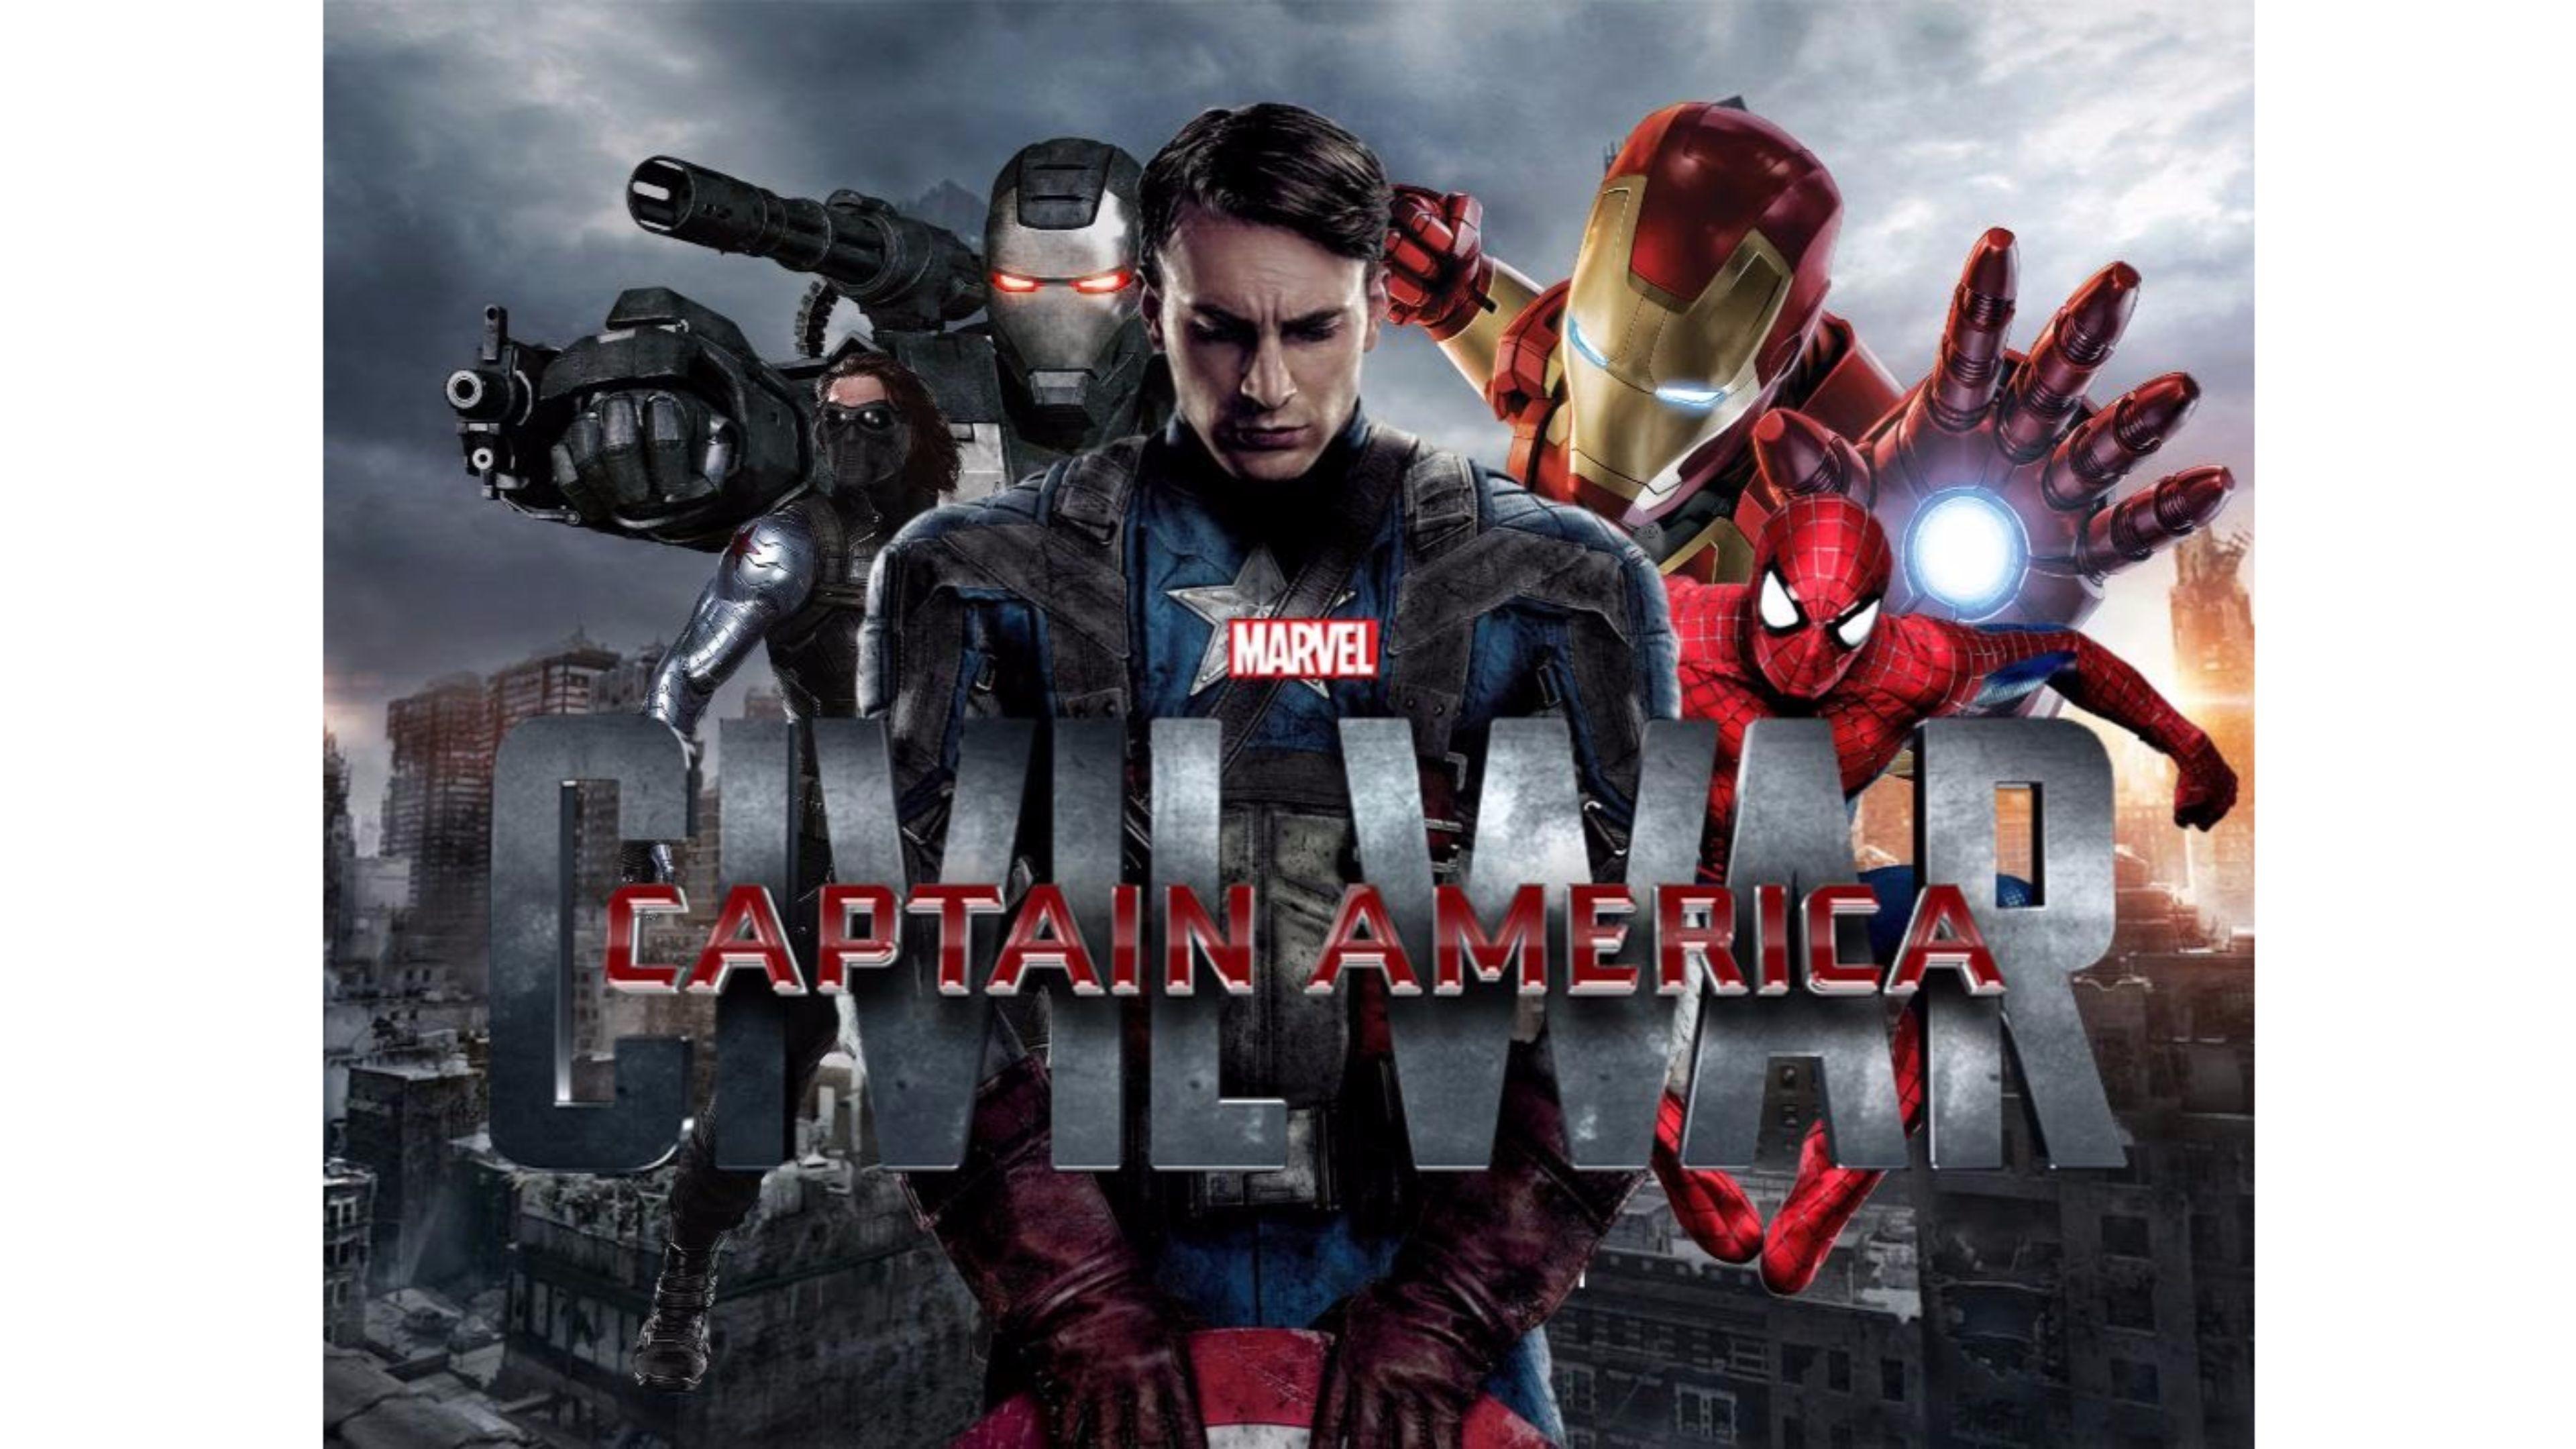 Captain America Civil War Wallpaper 4k: Captain America Civil War Desktop Wallpaper (77+ Images